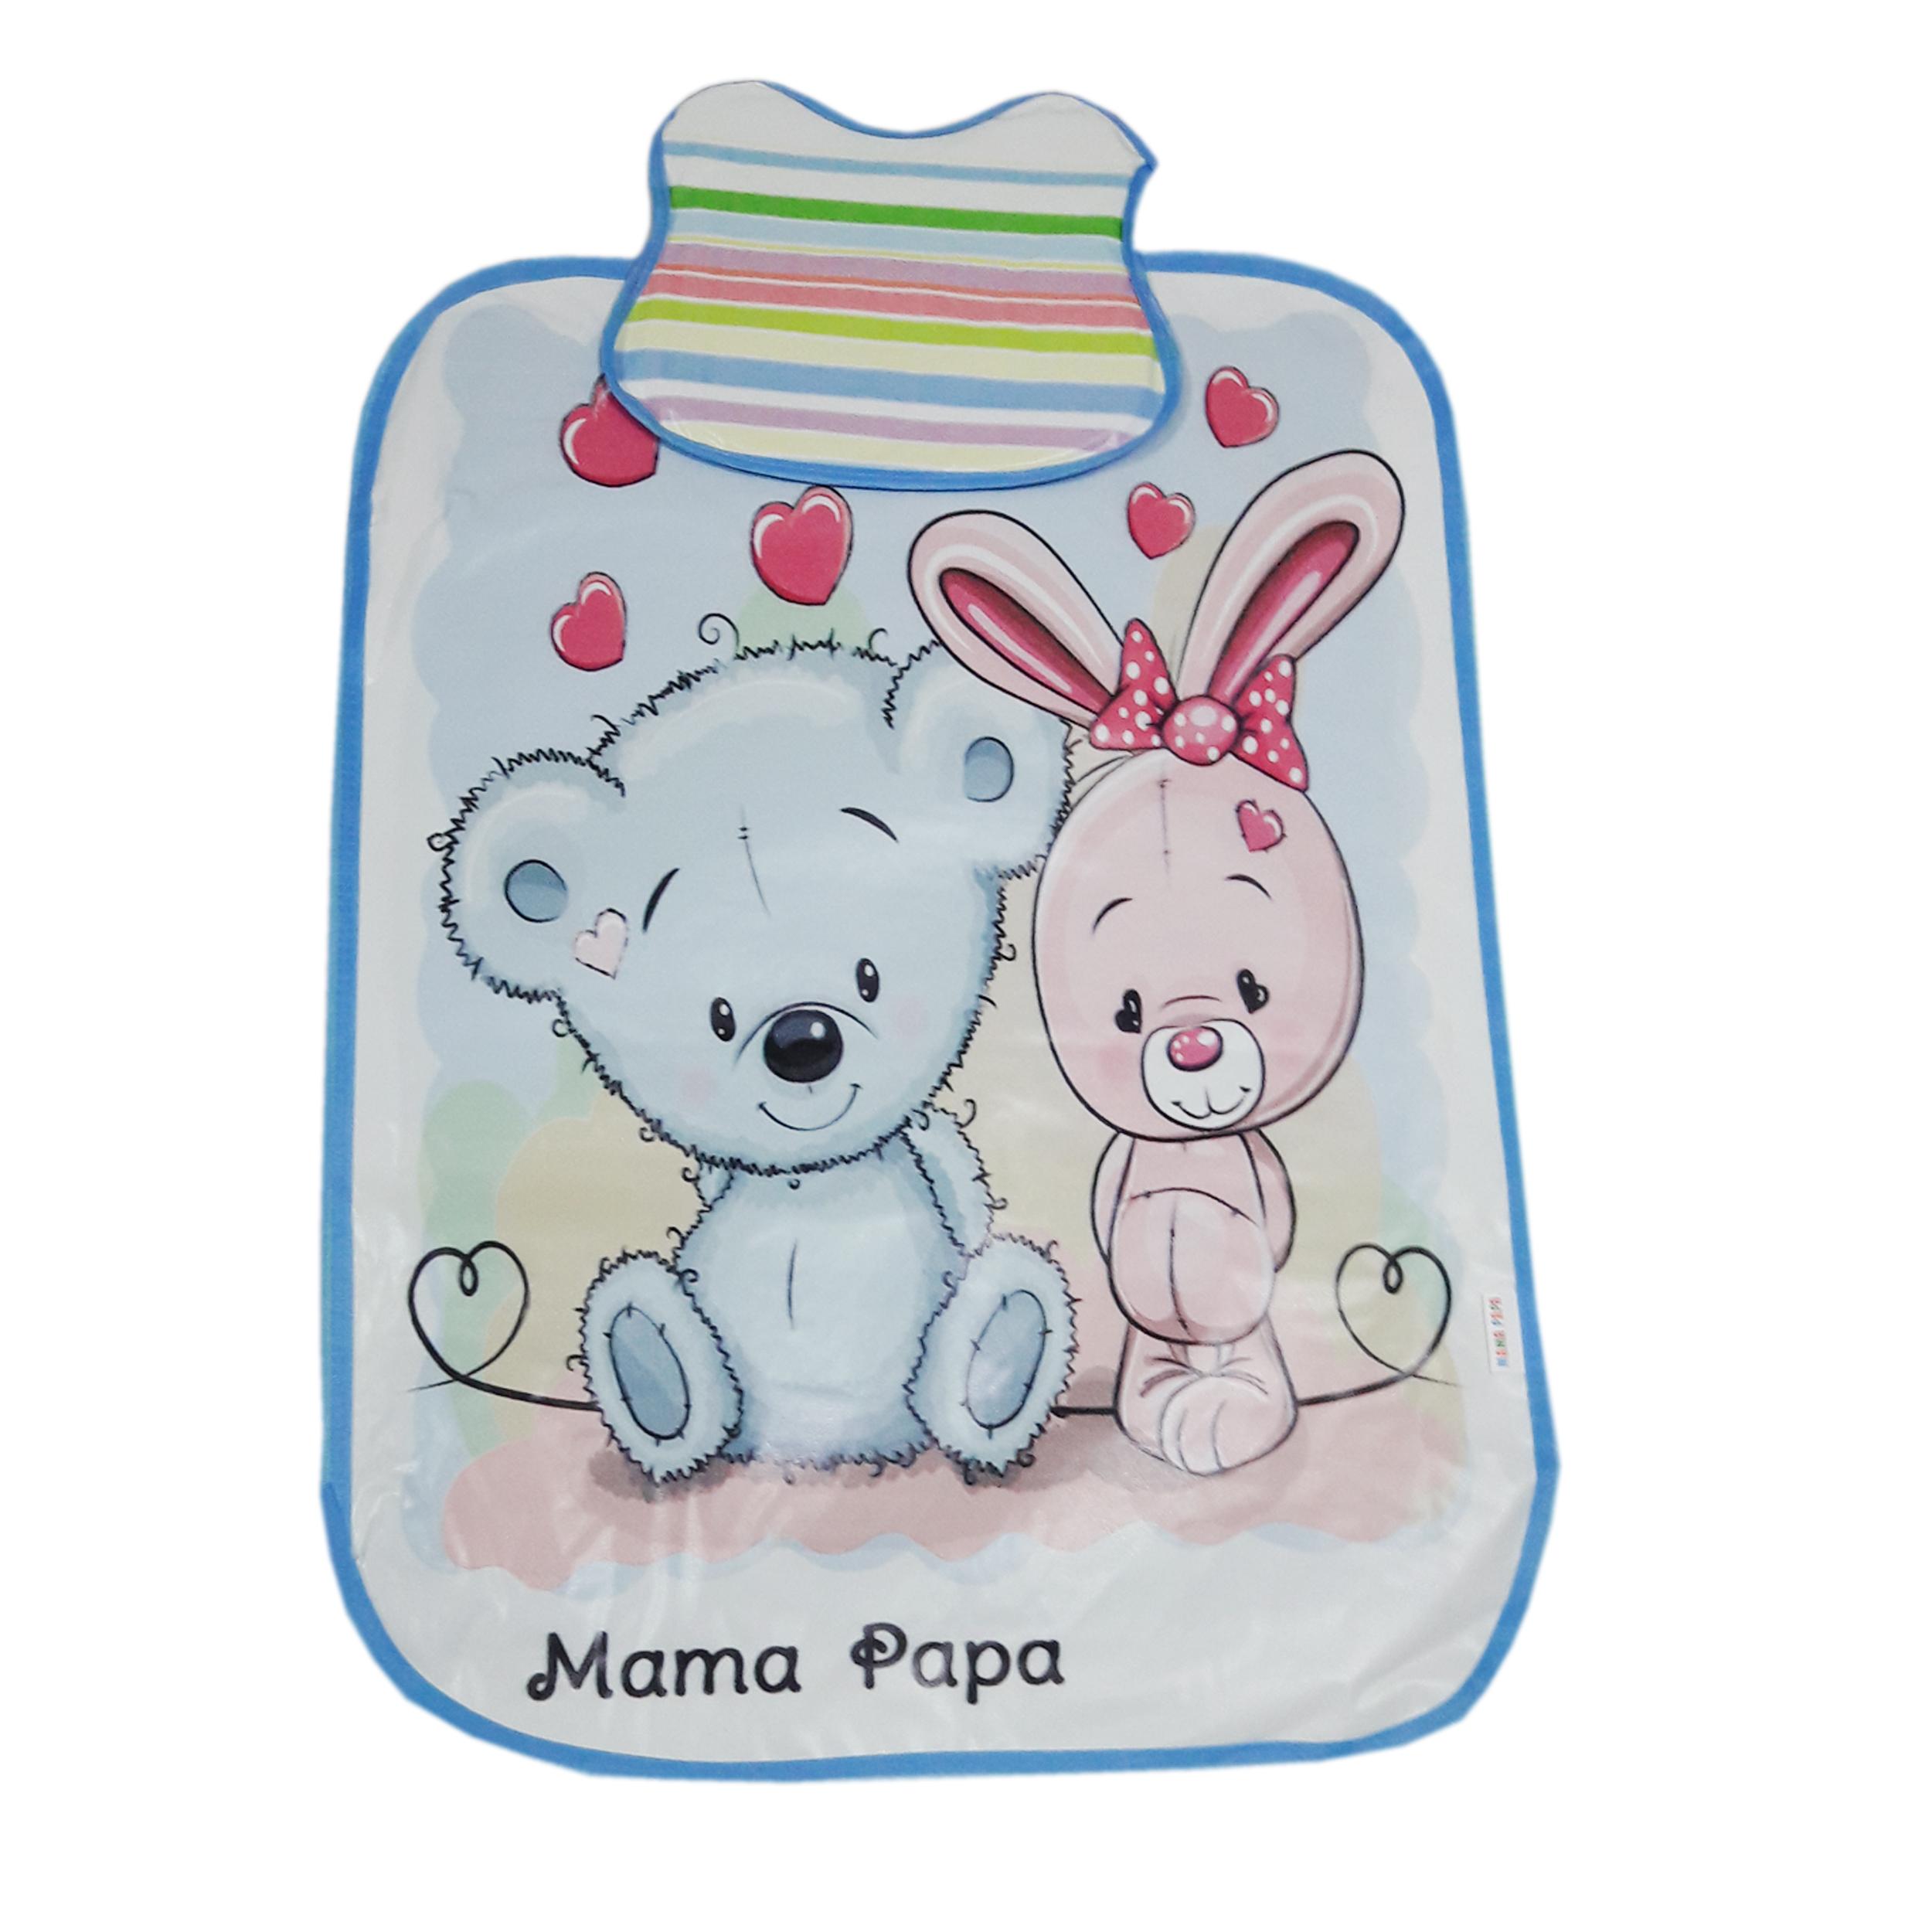 تشک تعویض نوزاد ماما پاپا مدل خرس و خرگوش